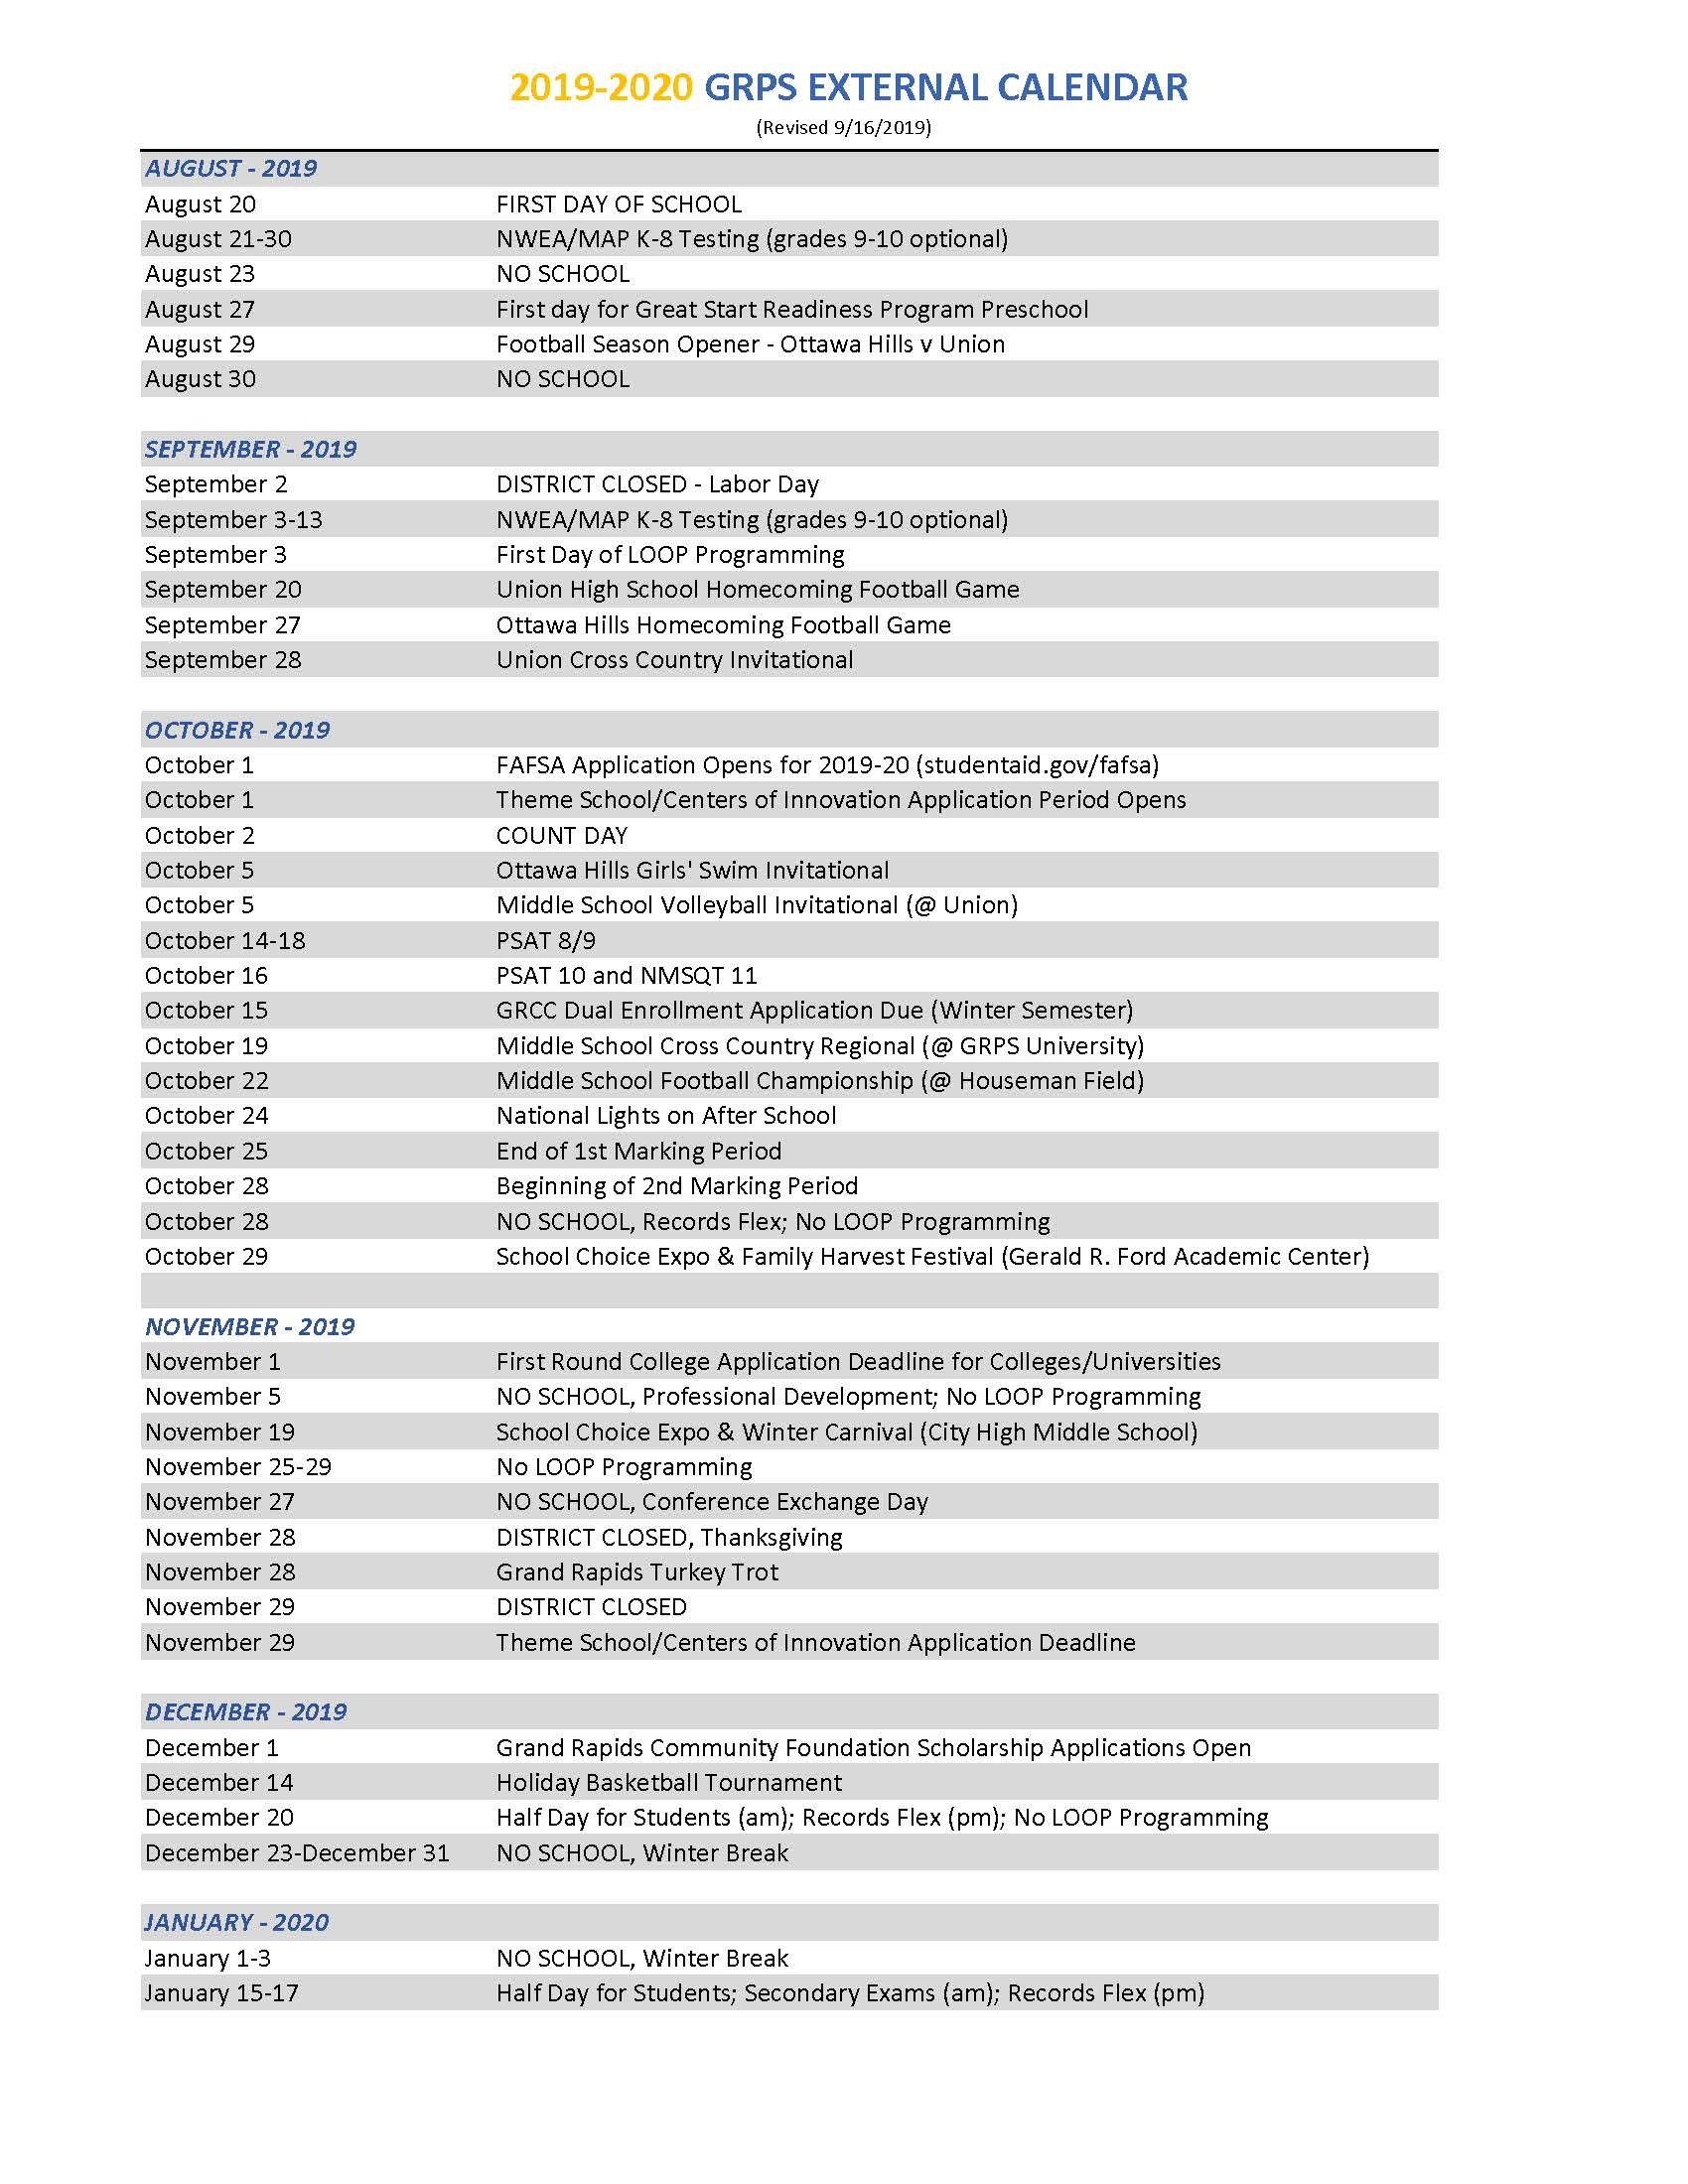 2019-2020 District Calendar inside When Does Grand Haven High School Start School 2020